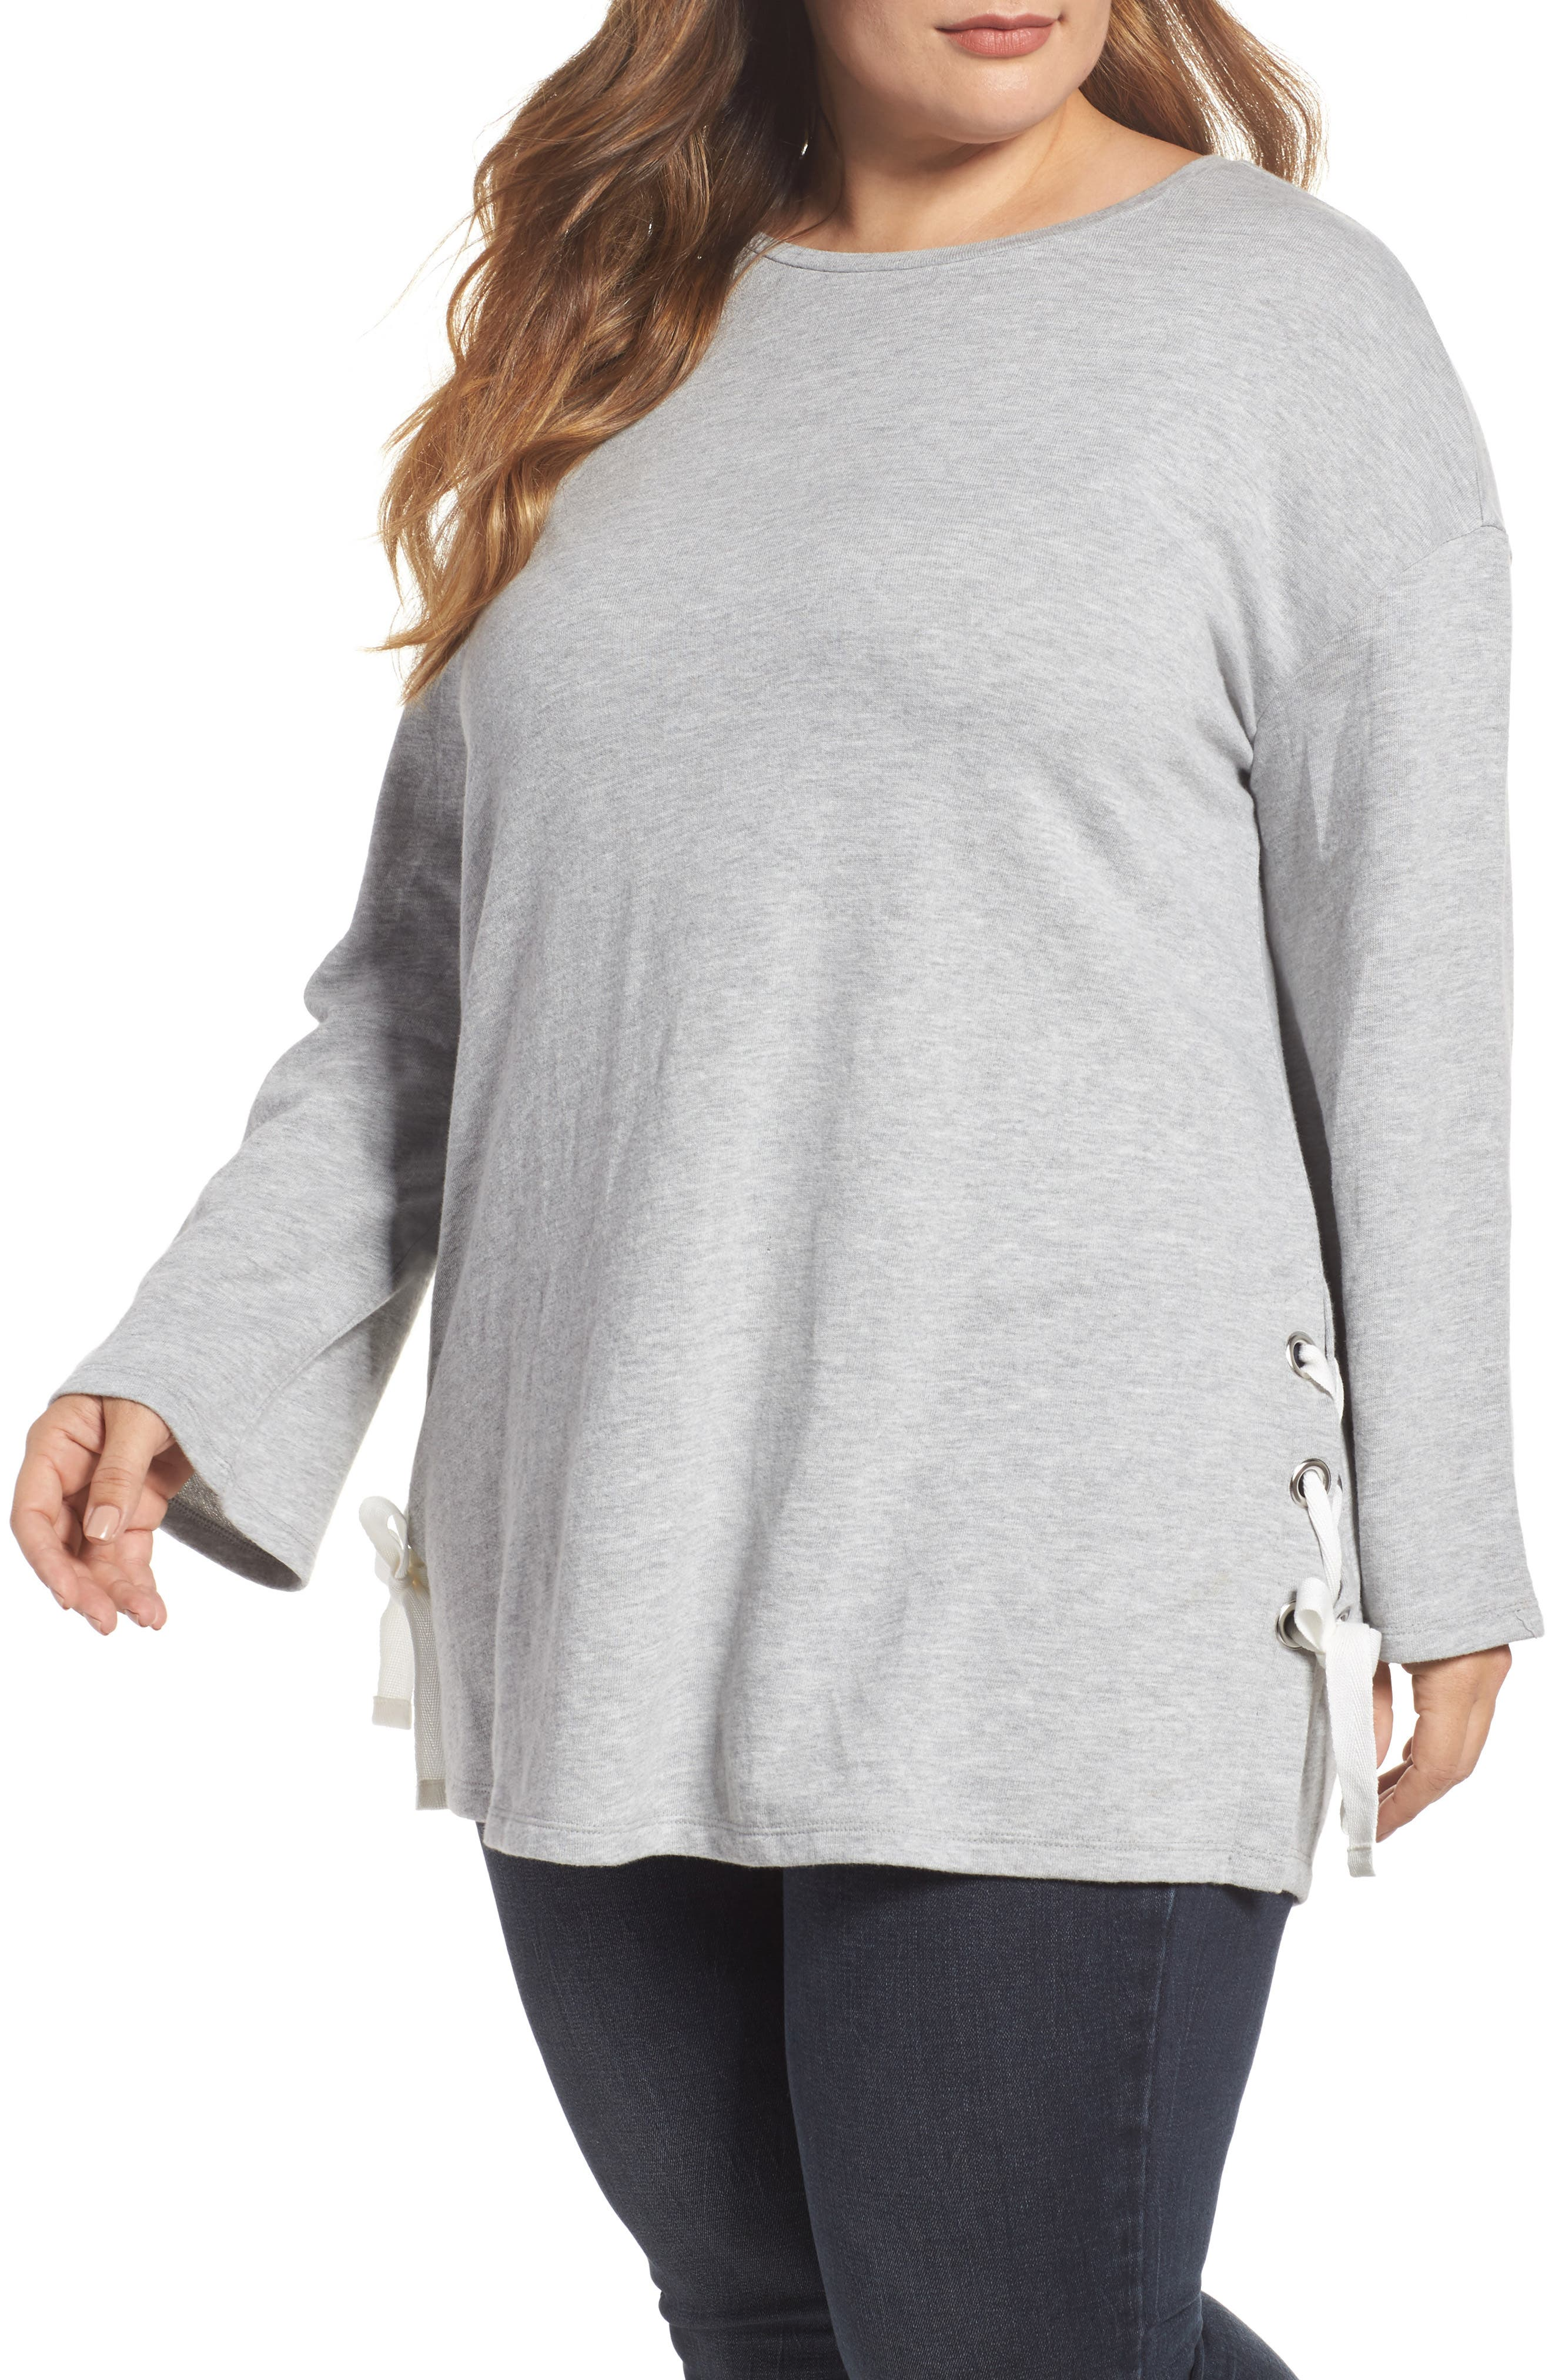 Lace-Up Side Sweatshirt,                         Main,                         color, Grey Heather